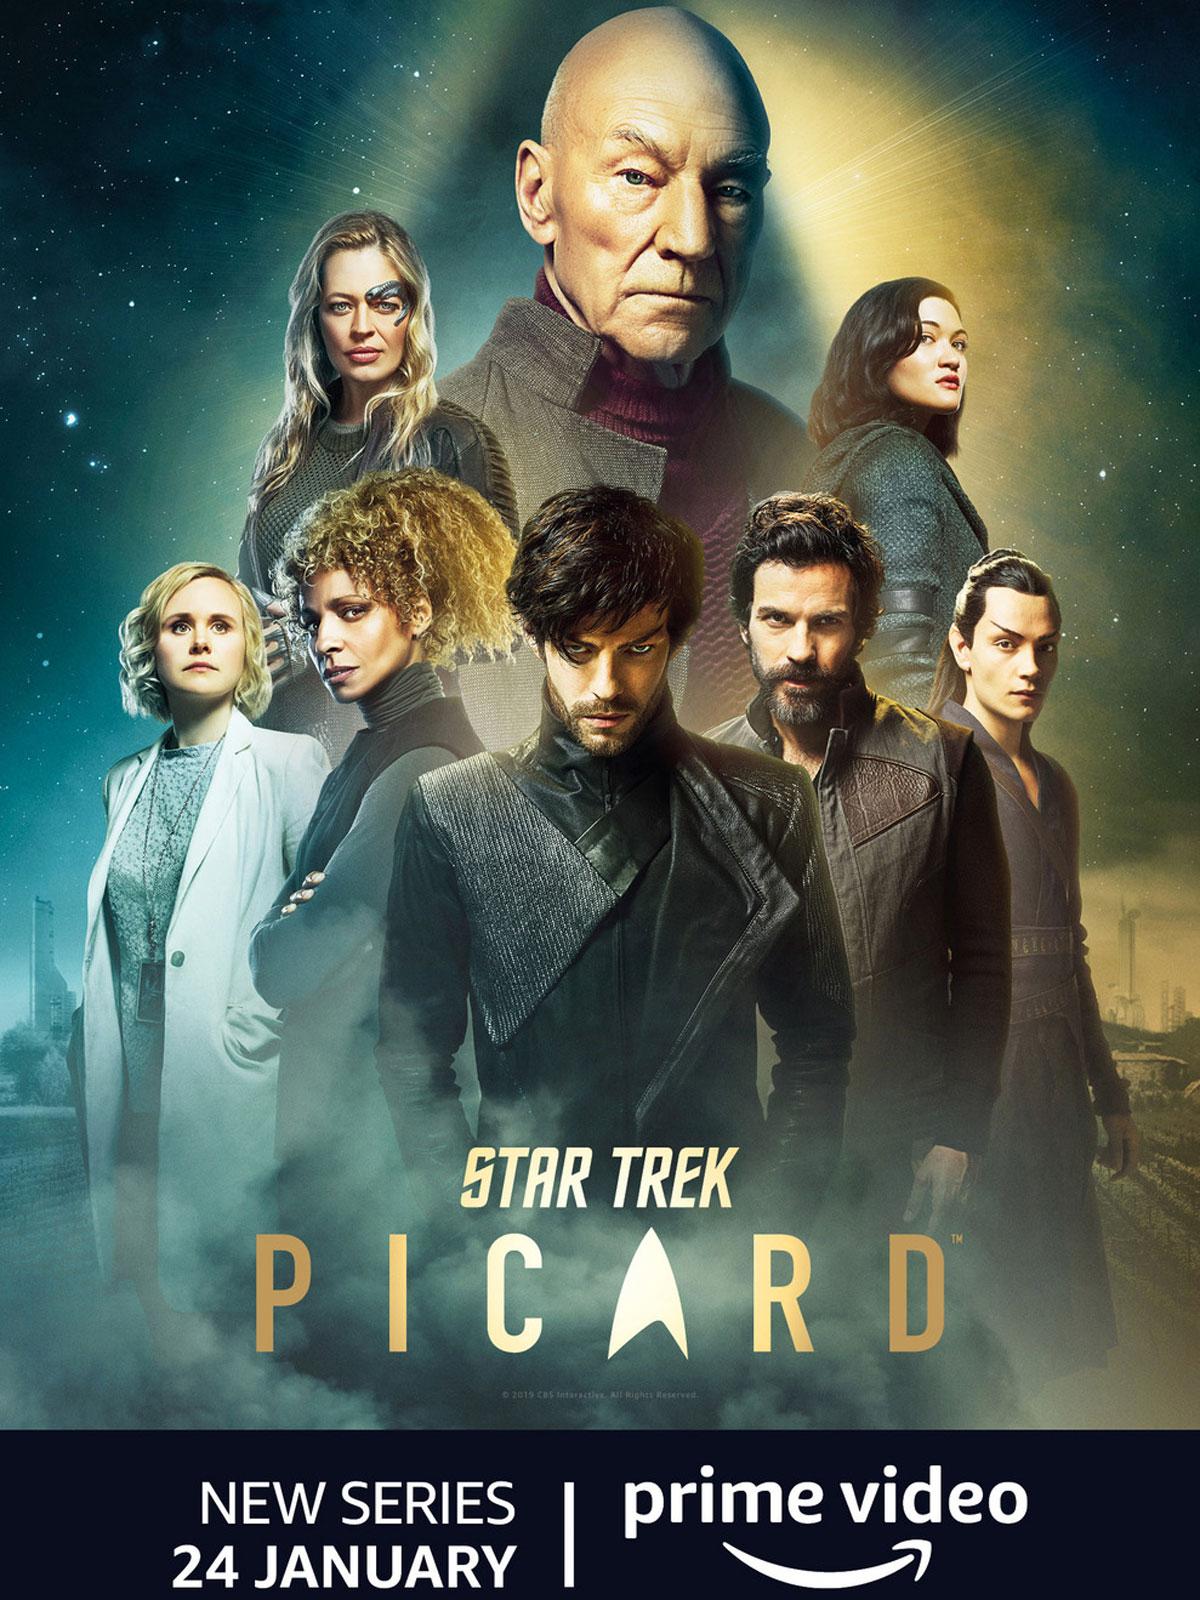 4 - Star Trek: Picard